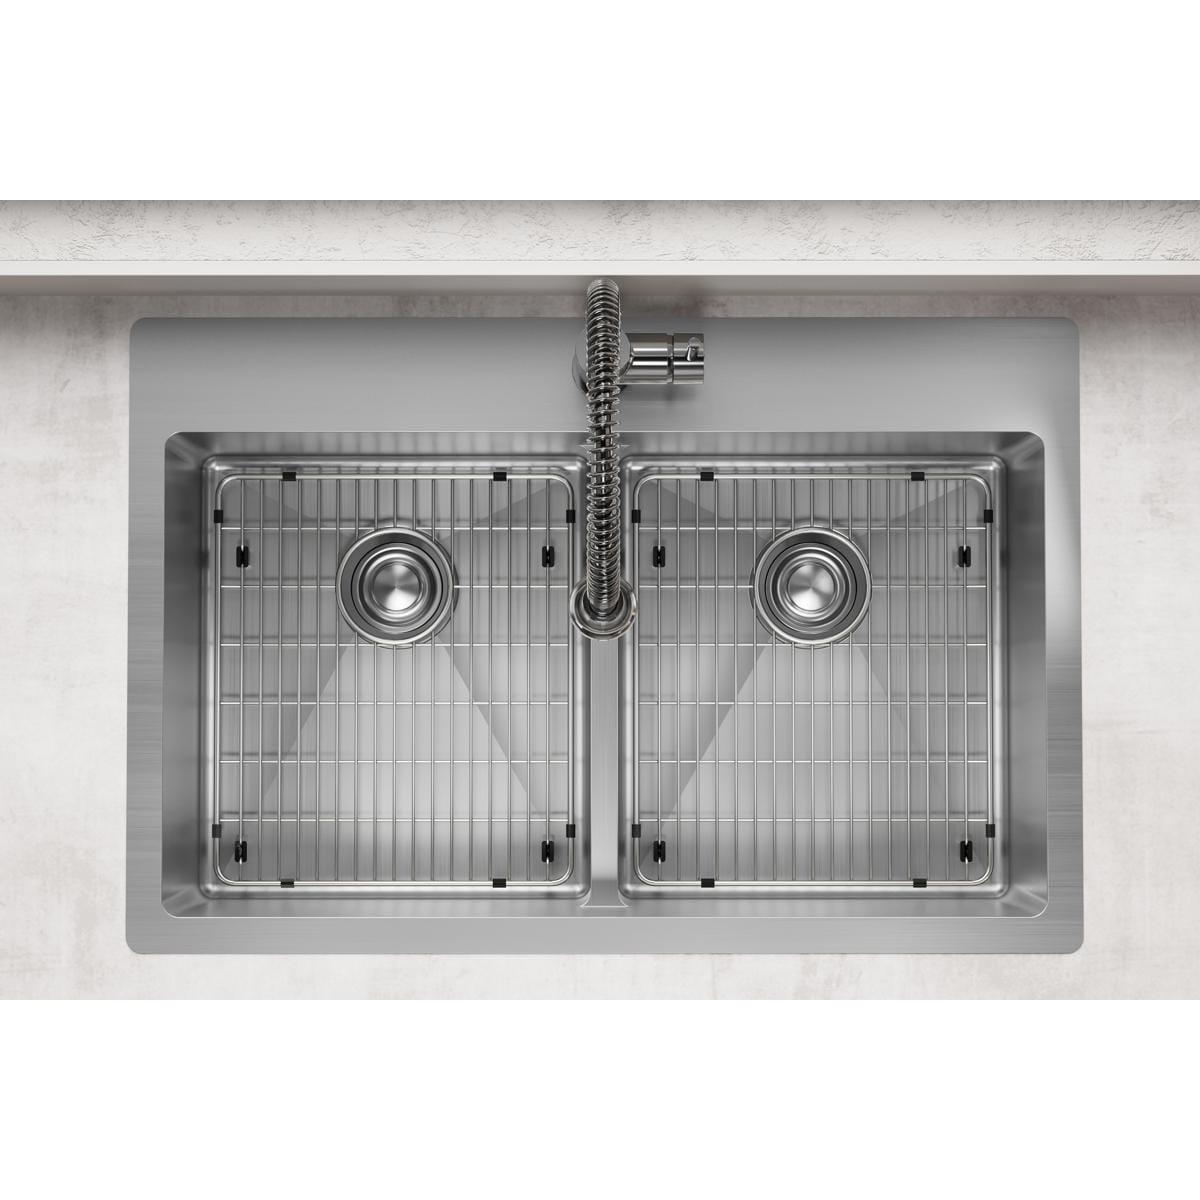 Elkay Crosstown 18 Gauge Stainless Steel 33 X 22 X 9 Equal Double Bowl Dual Mount Sink Kit With Aqua Divide Overstock 30533364